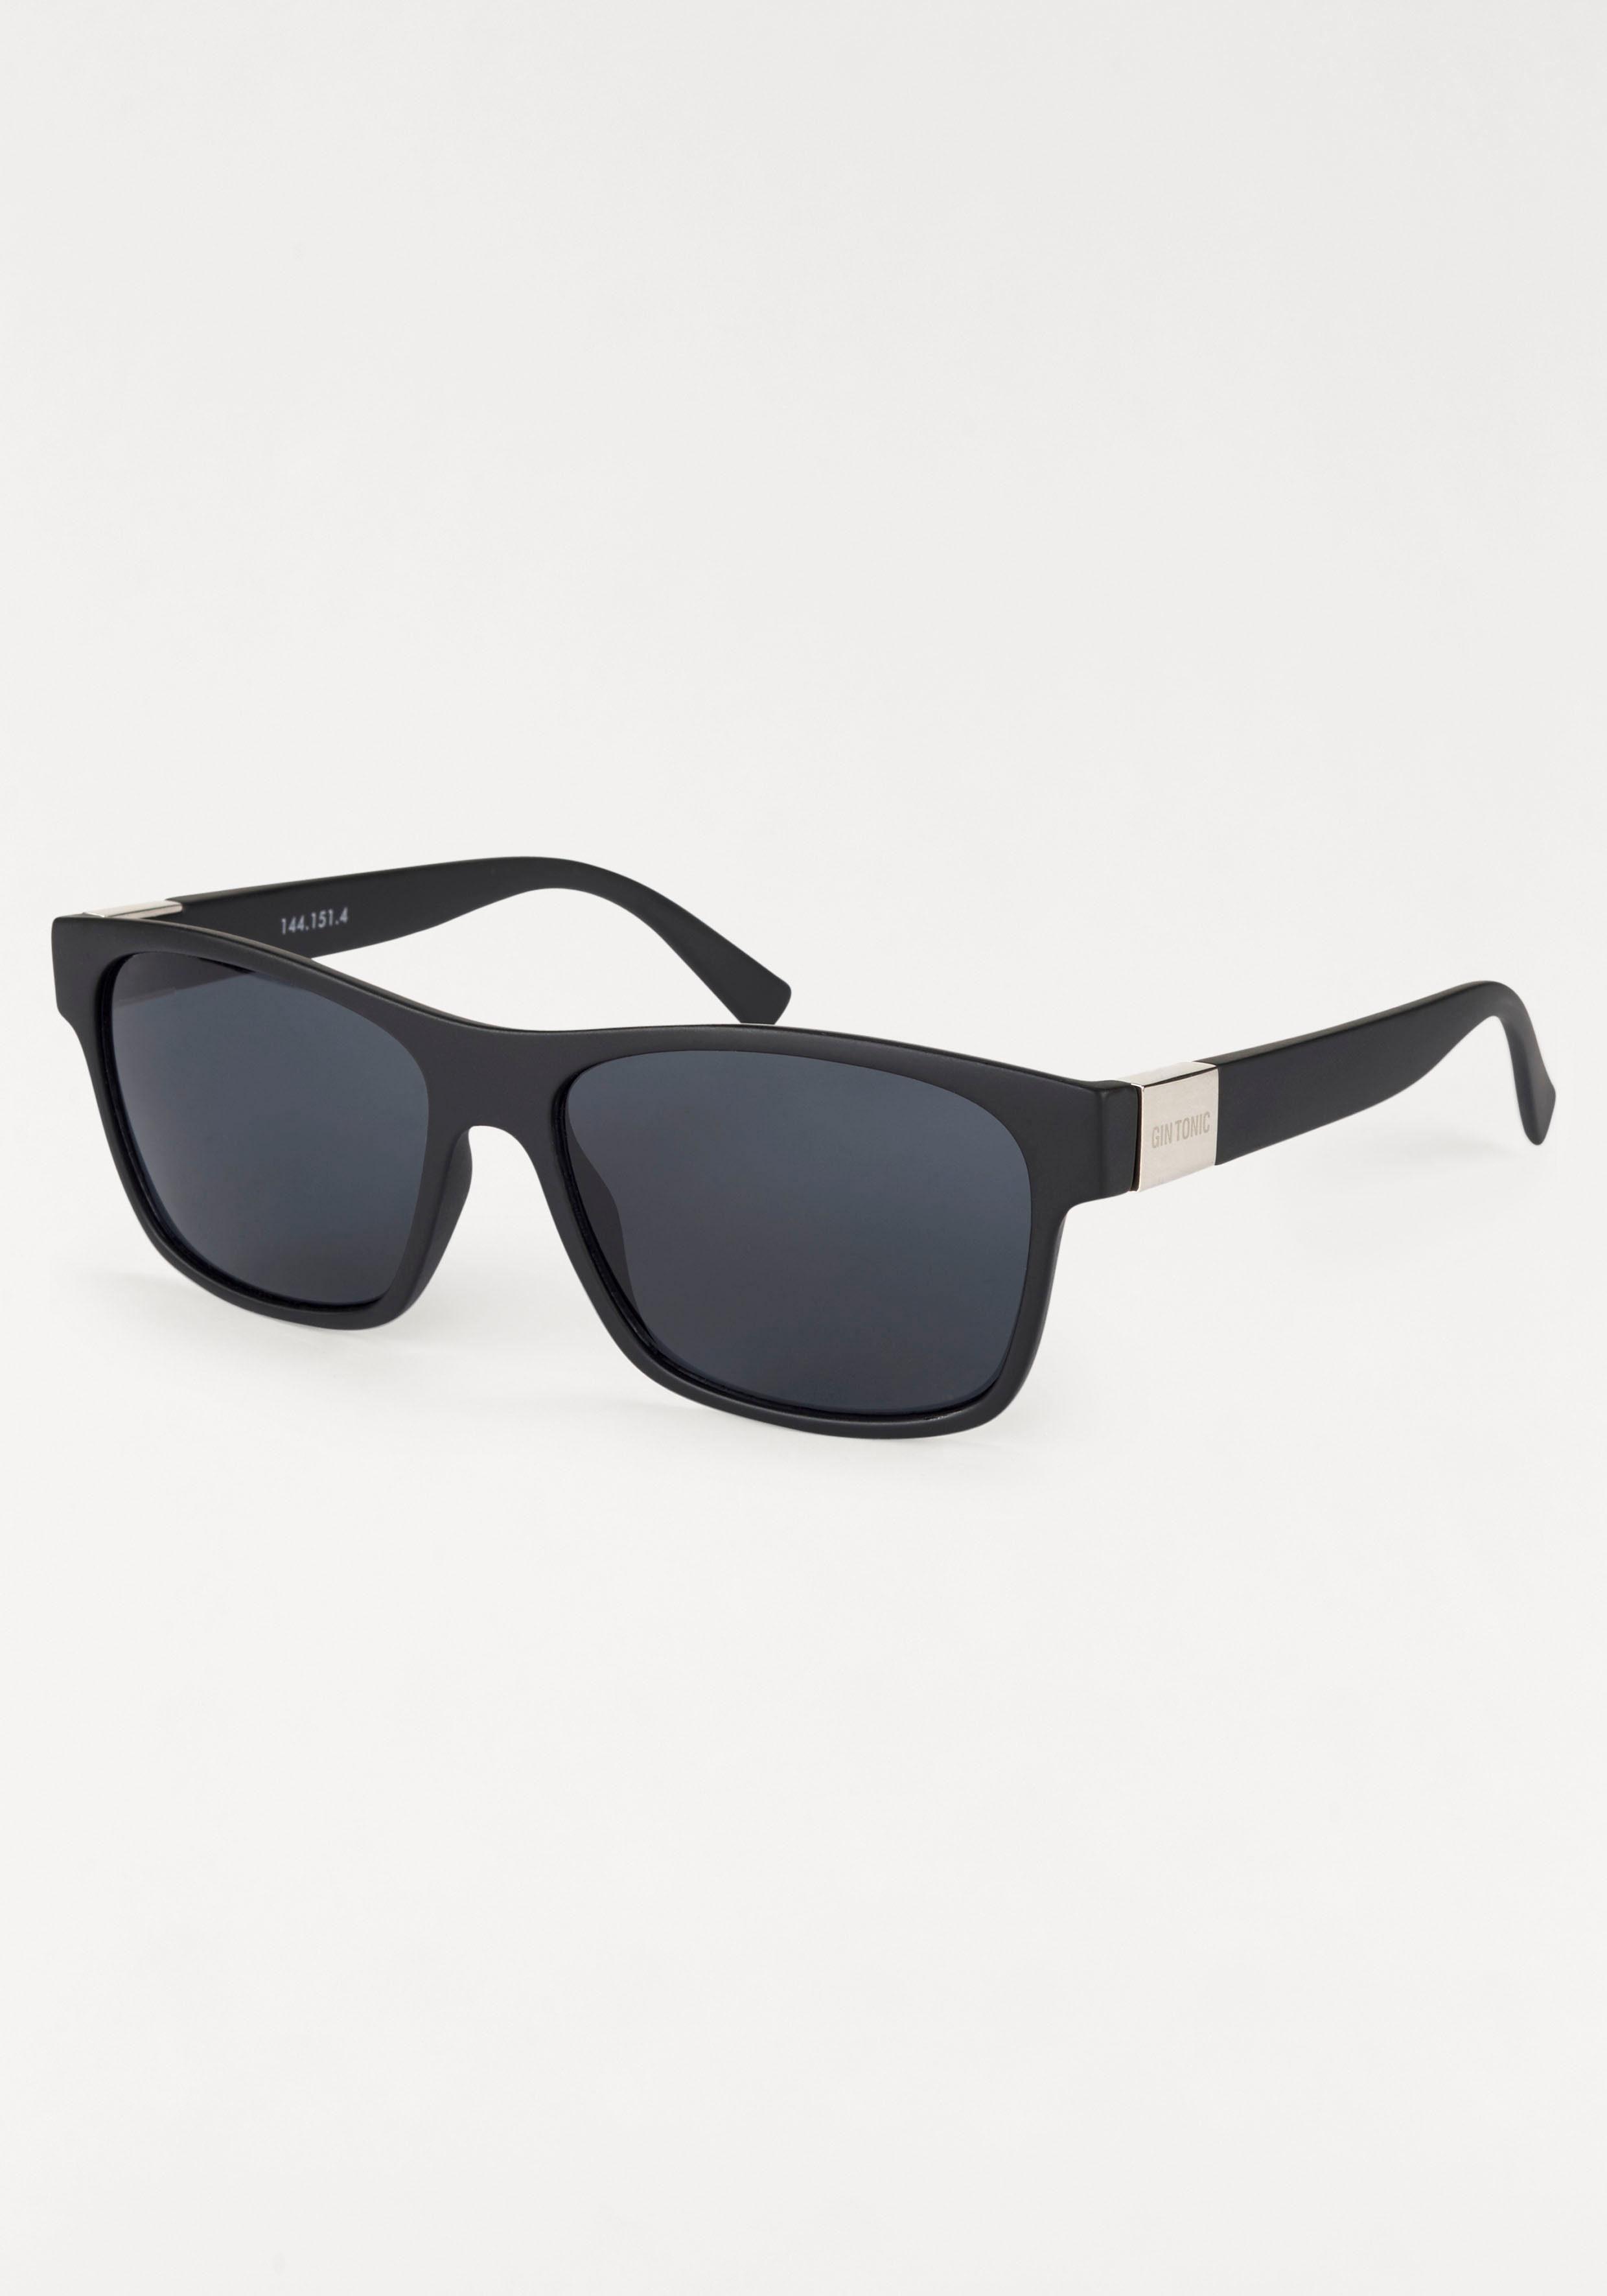 Gin Tonic Sonnenbrille im coolen Design